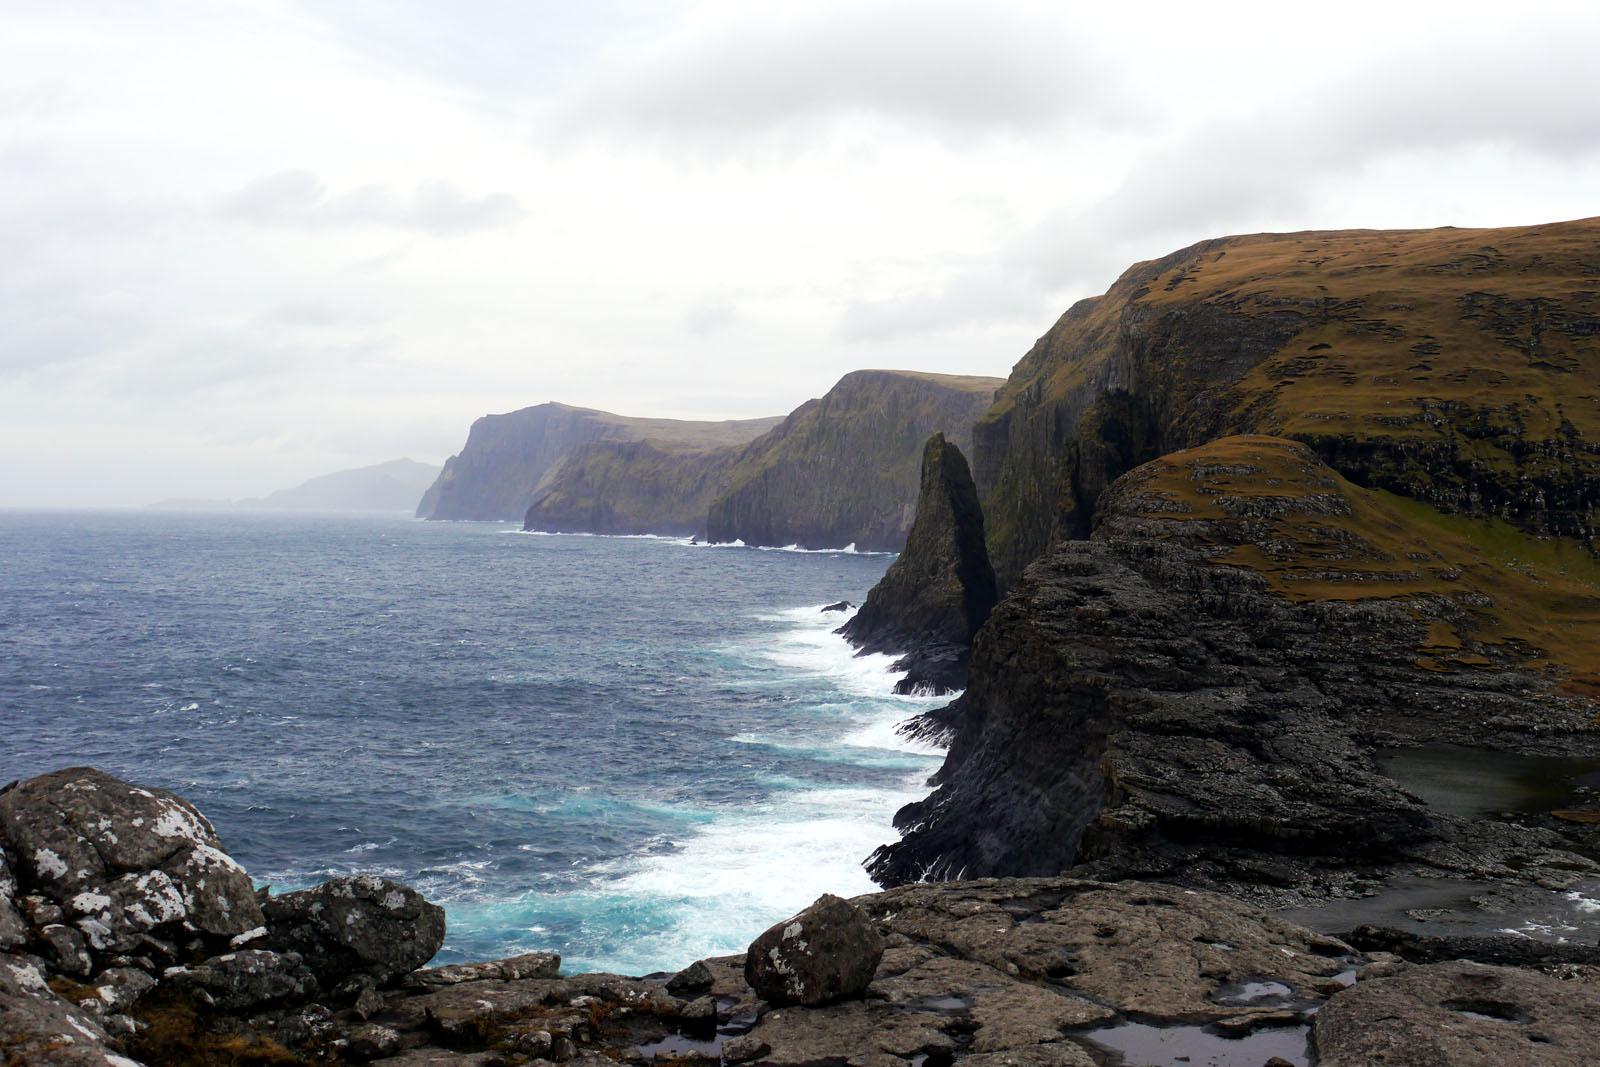 Vagar-Faroer Inseln-Leitisvatn-Sorvagsvatn-Wanderung-Klippe-Atlantik